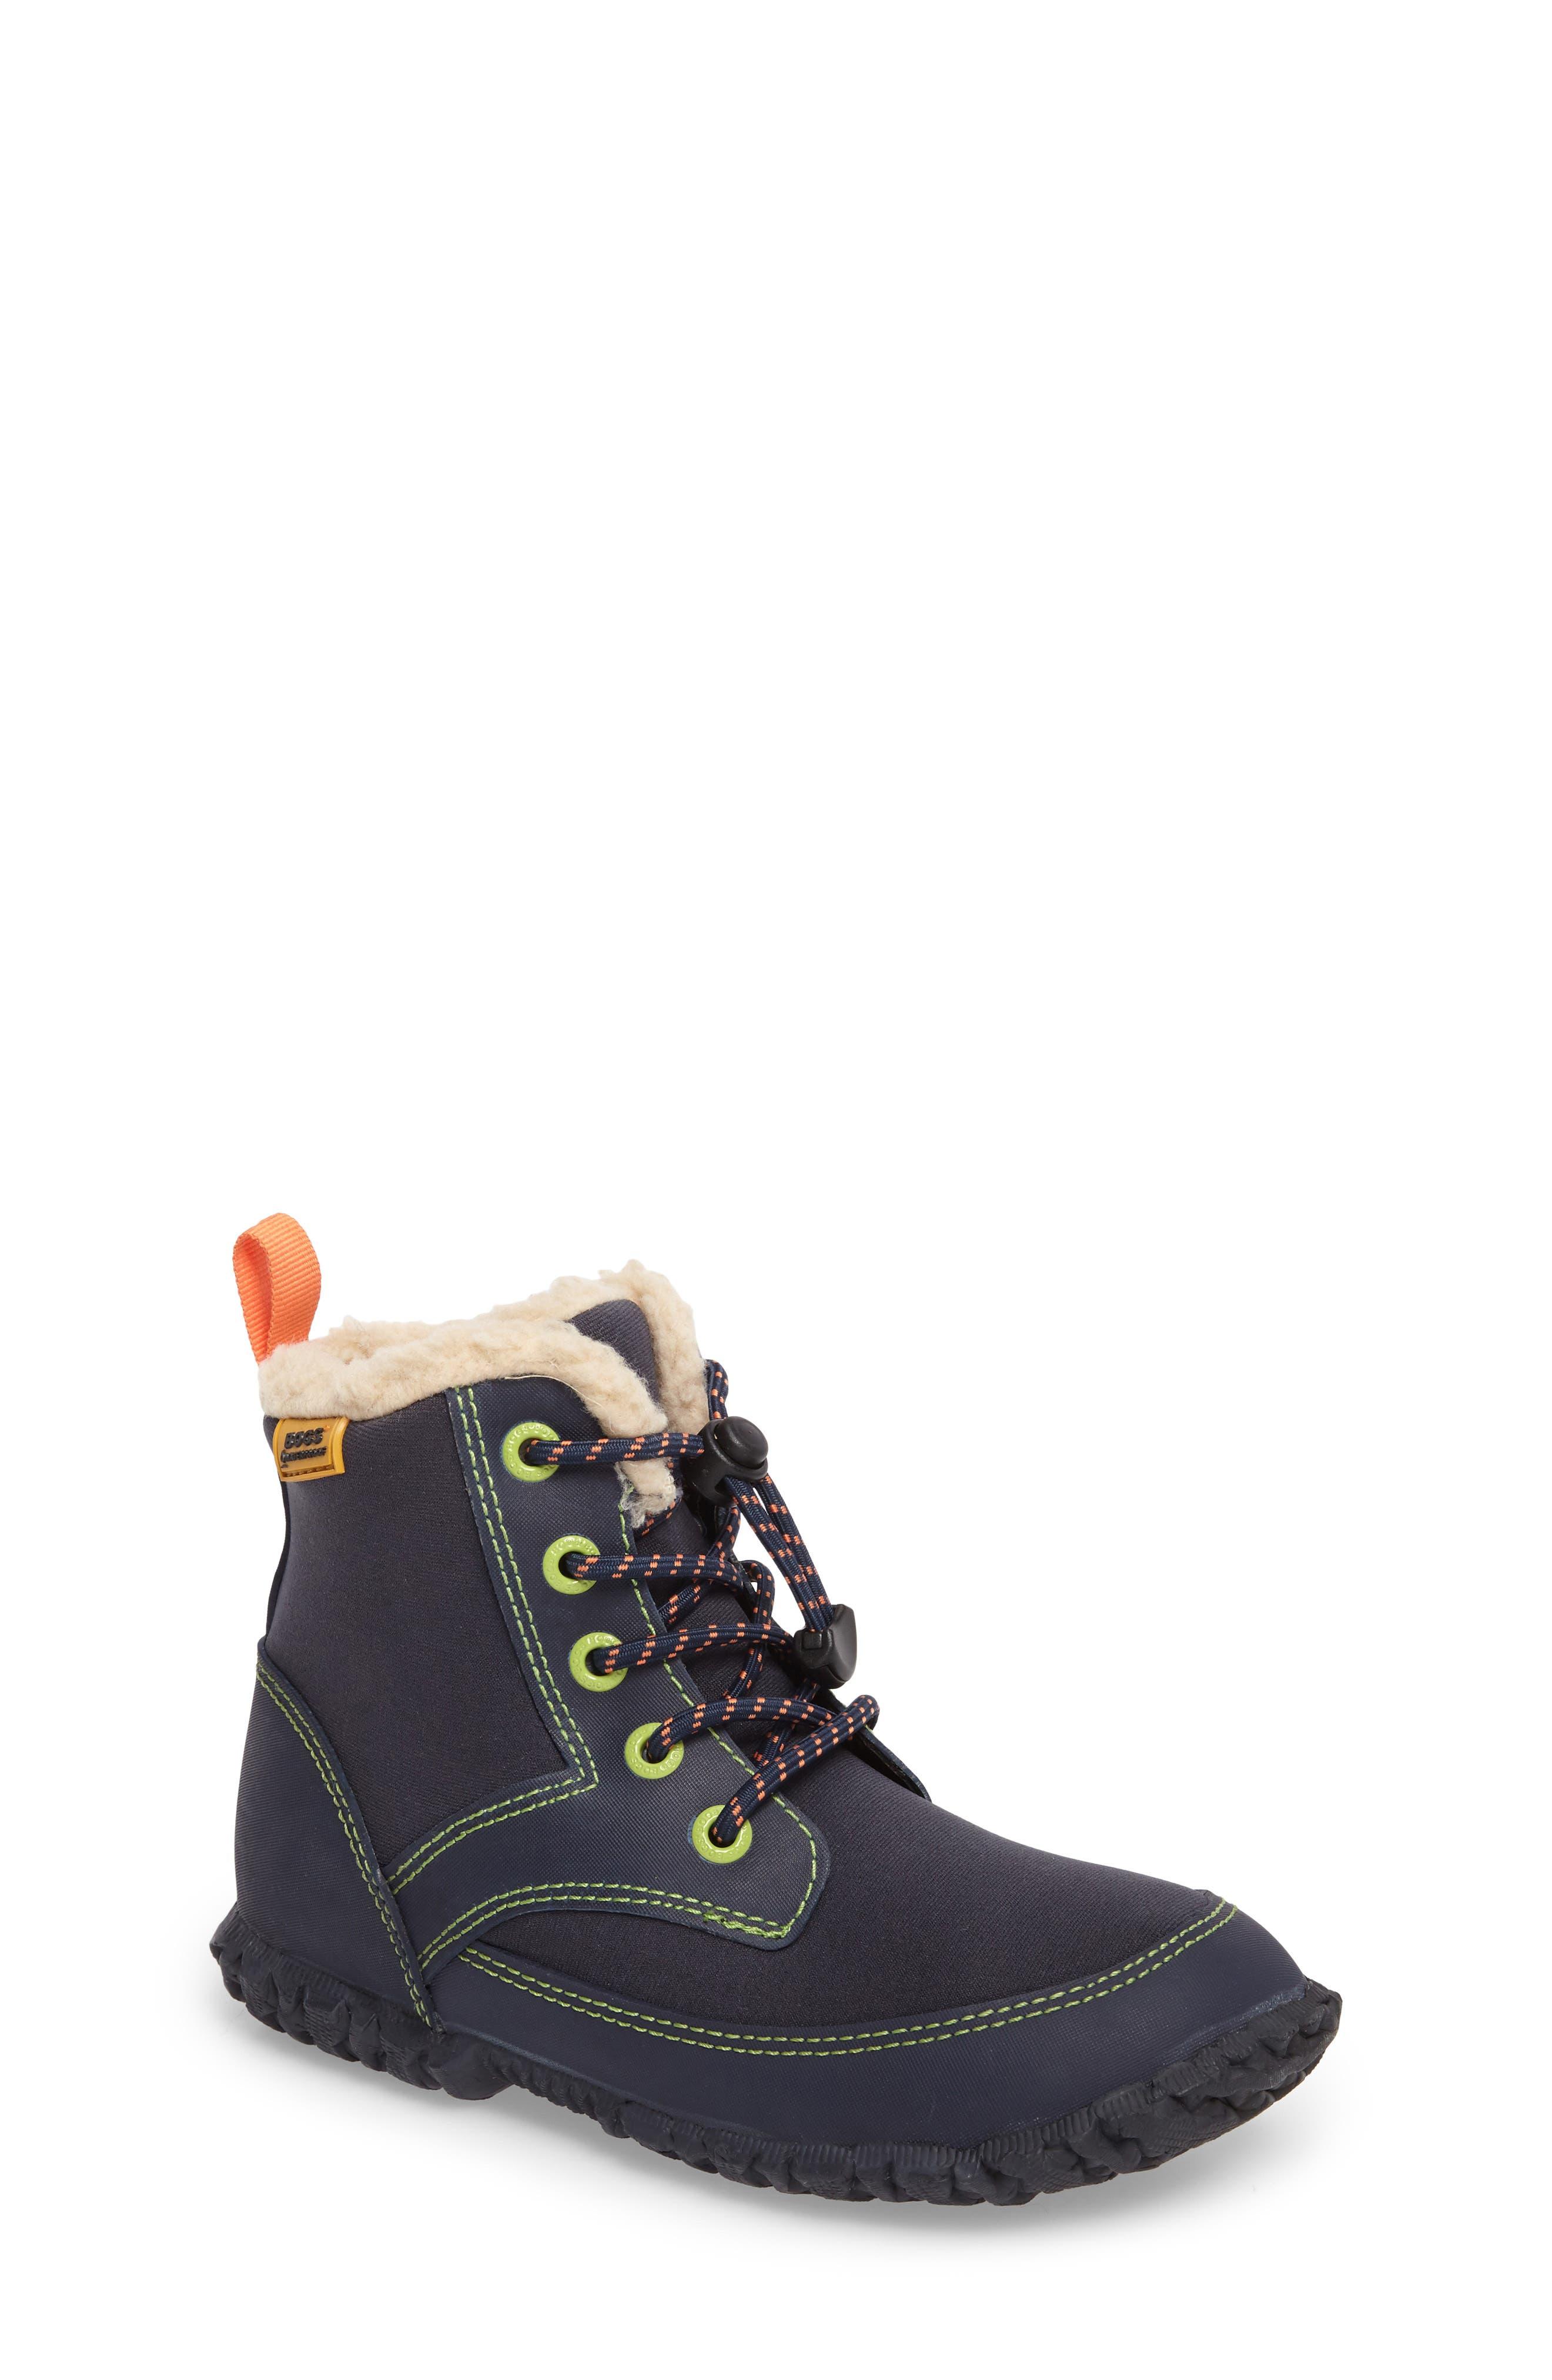 Skyler Faux Fur Insulated Waterproof Boot,                             Main thumbnail 1, color,                             Dark Blue Multi